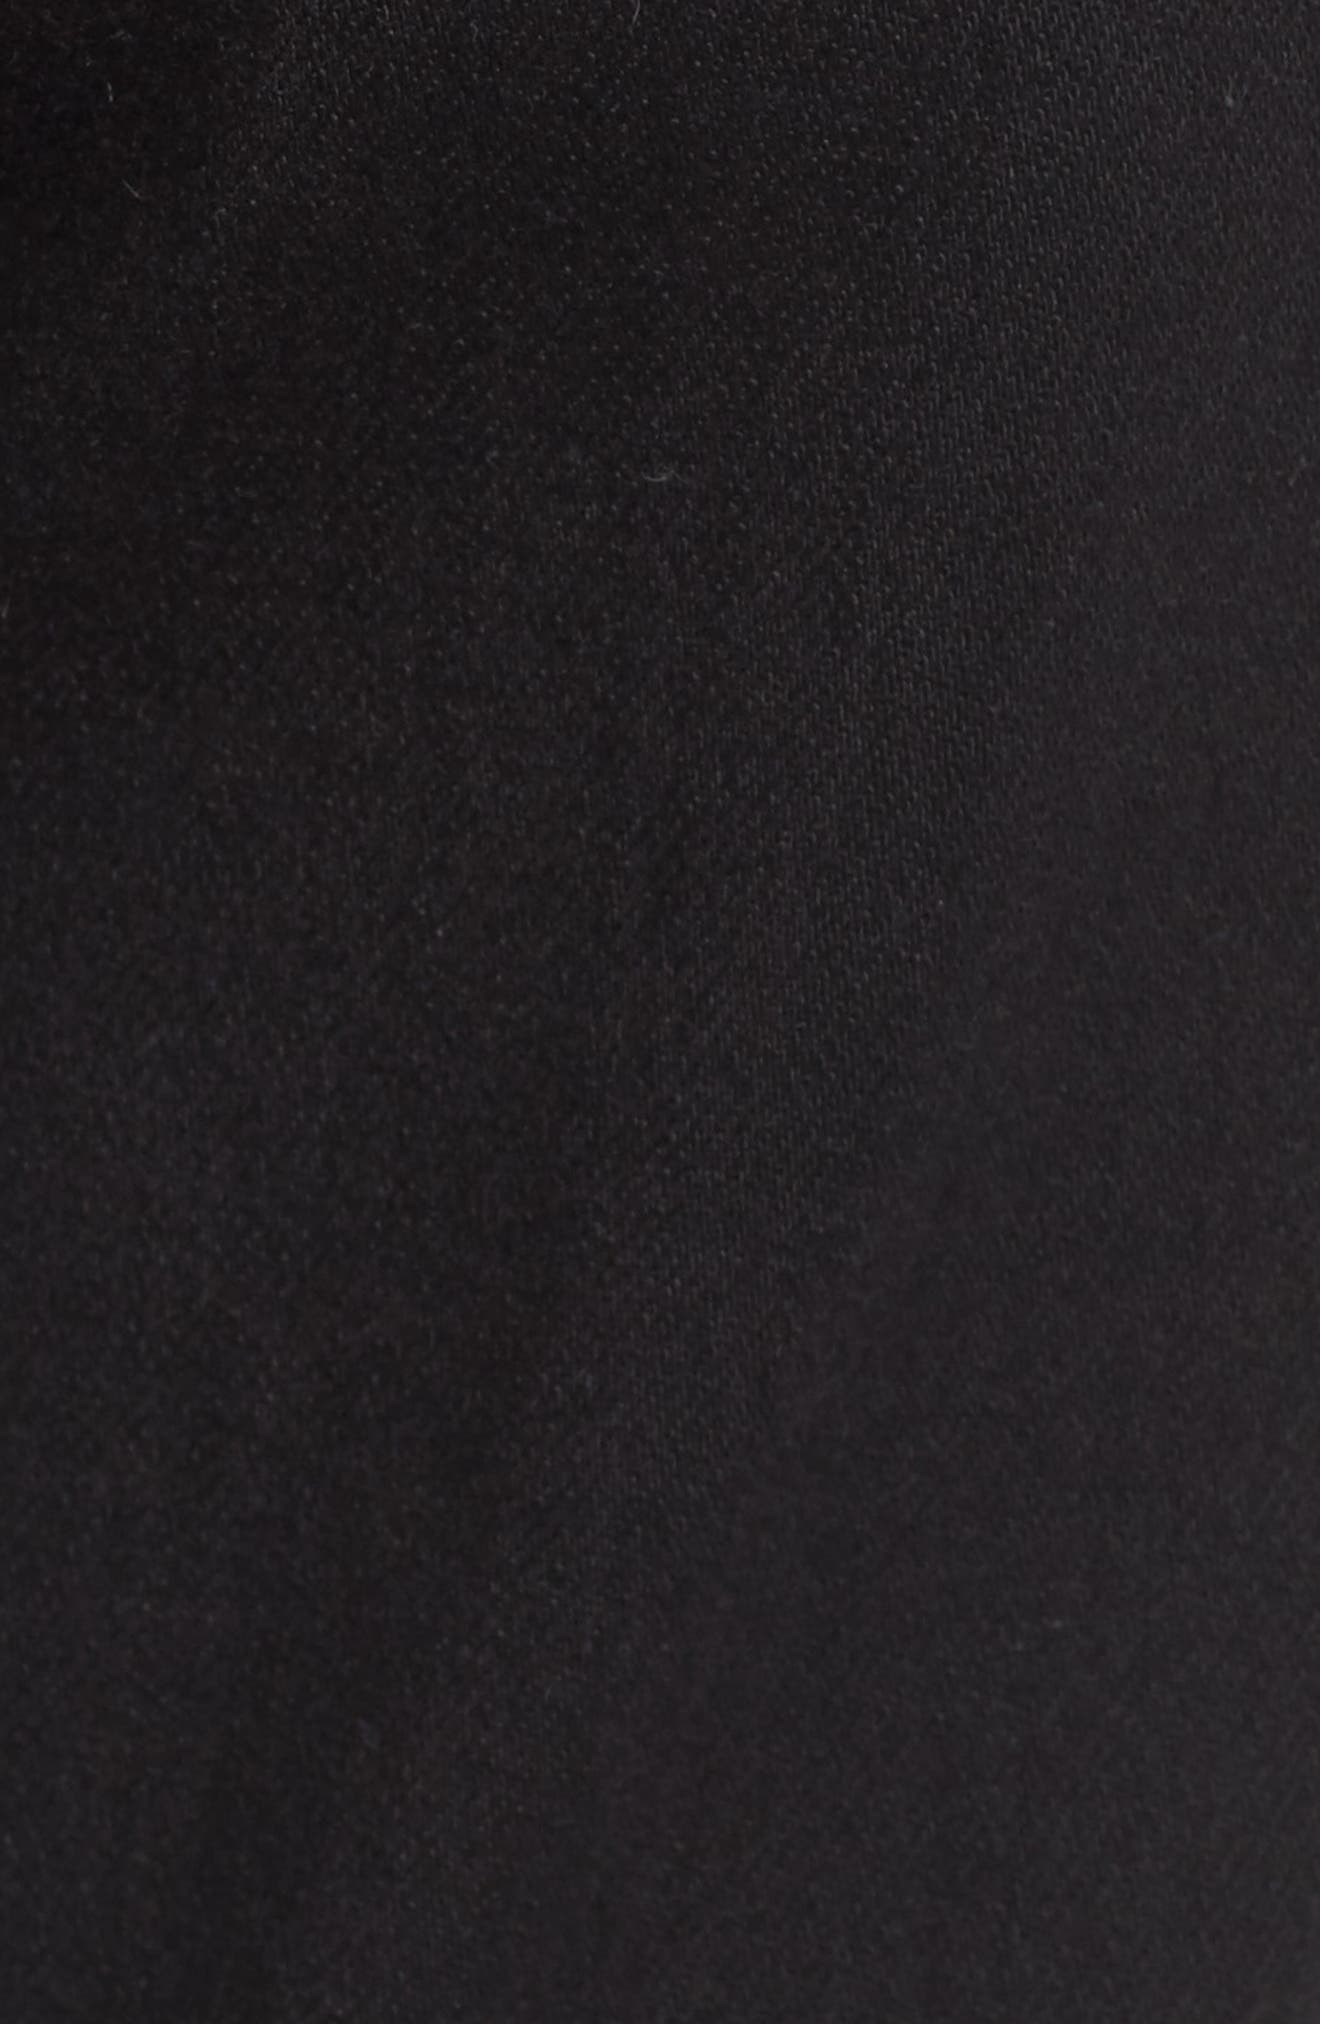 Priscilla High Waist Crop Flare Jeans,                             Alternate thumbnail 5, color,                             Night Black